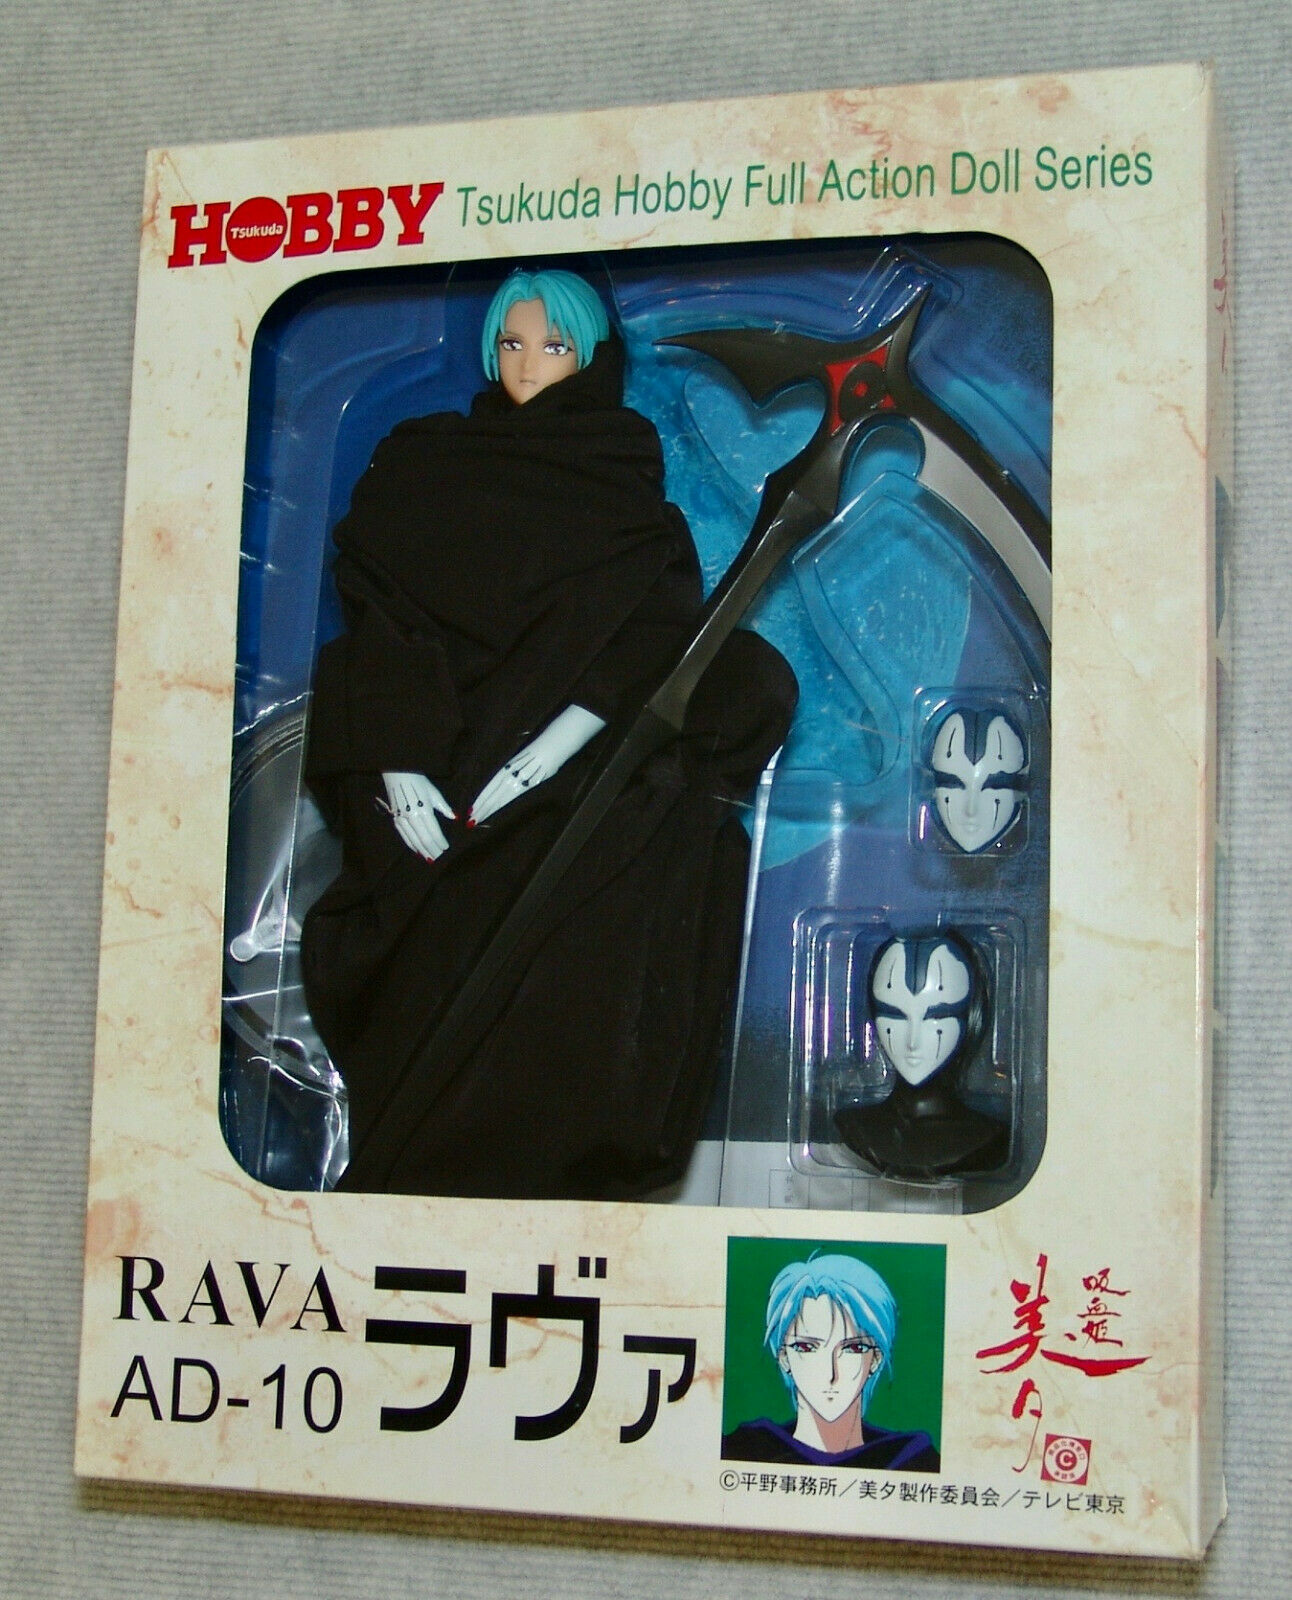 NYA Vampyr Prinsessan Miyu Rava Larva AD -10 Full Action Doll Figur Tsukauda Hobby